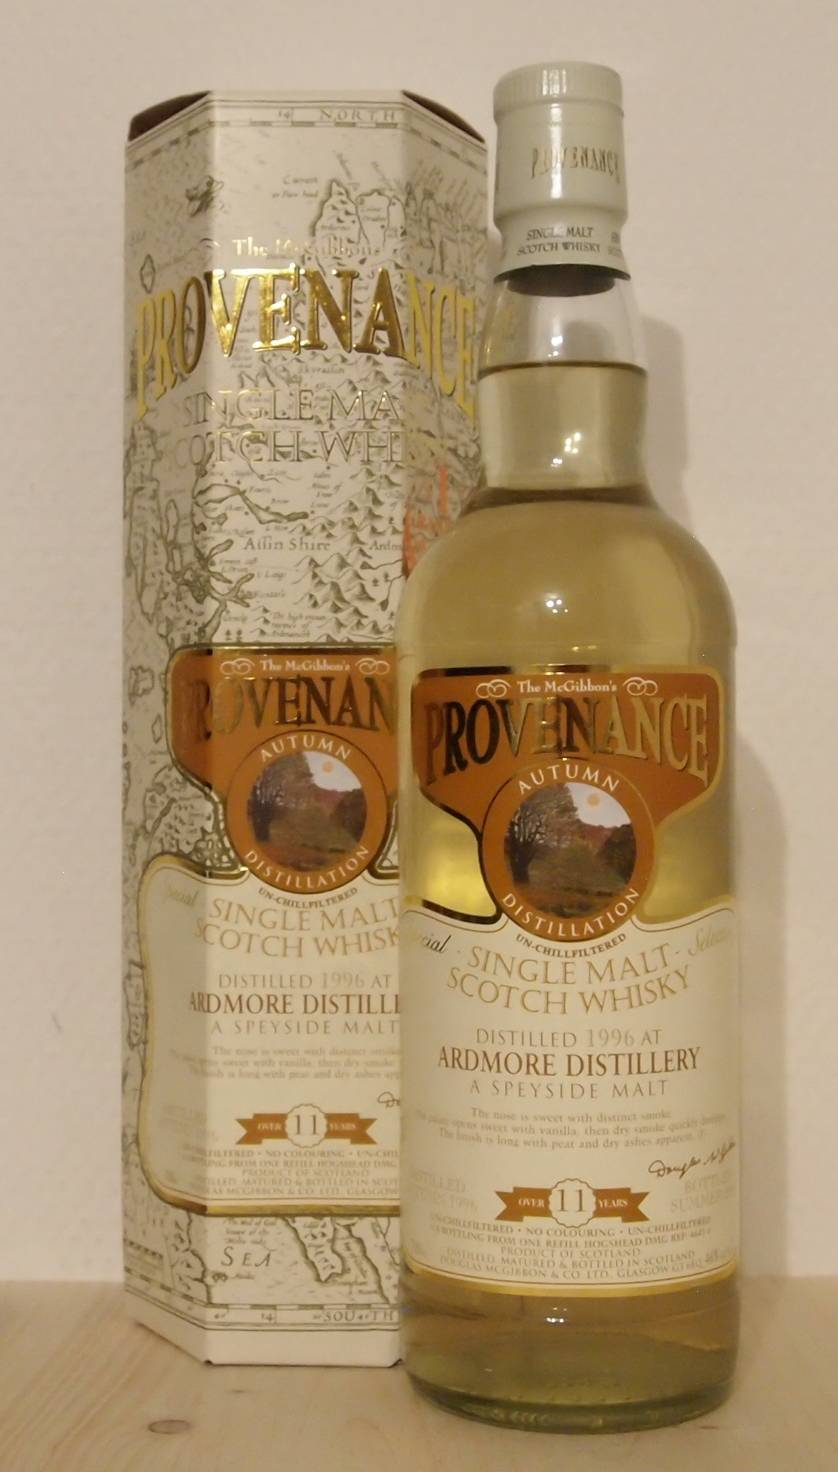 Single Malt Whisky Ardmore 11yo, Provenance, Cask 4645, 1996